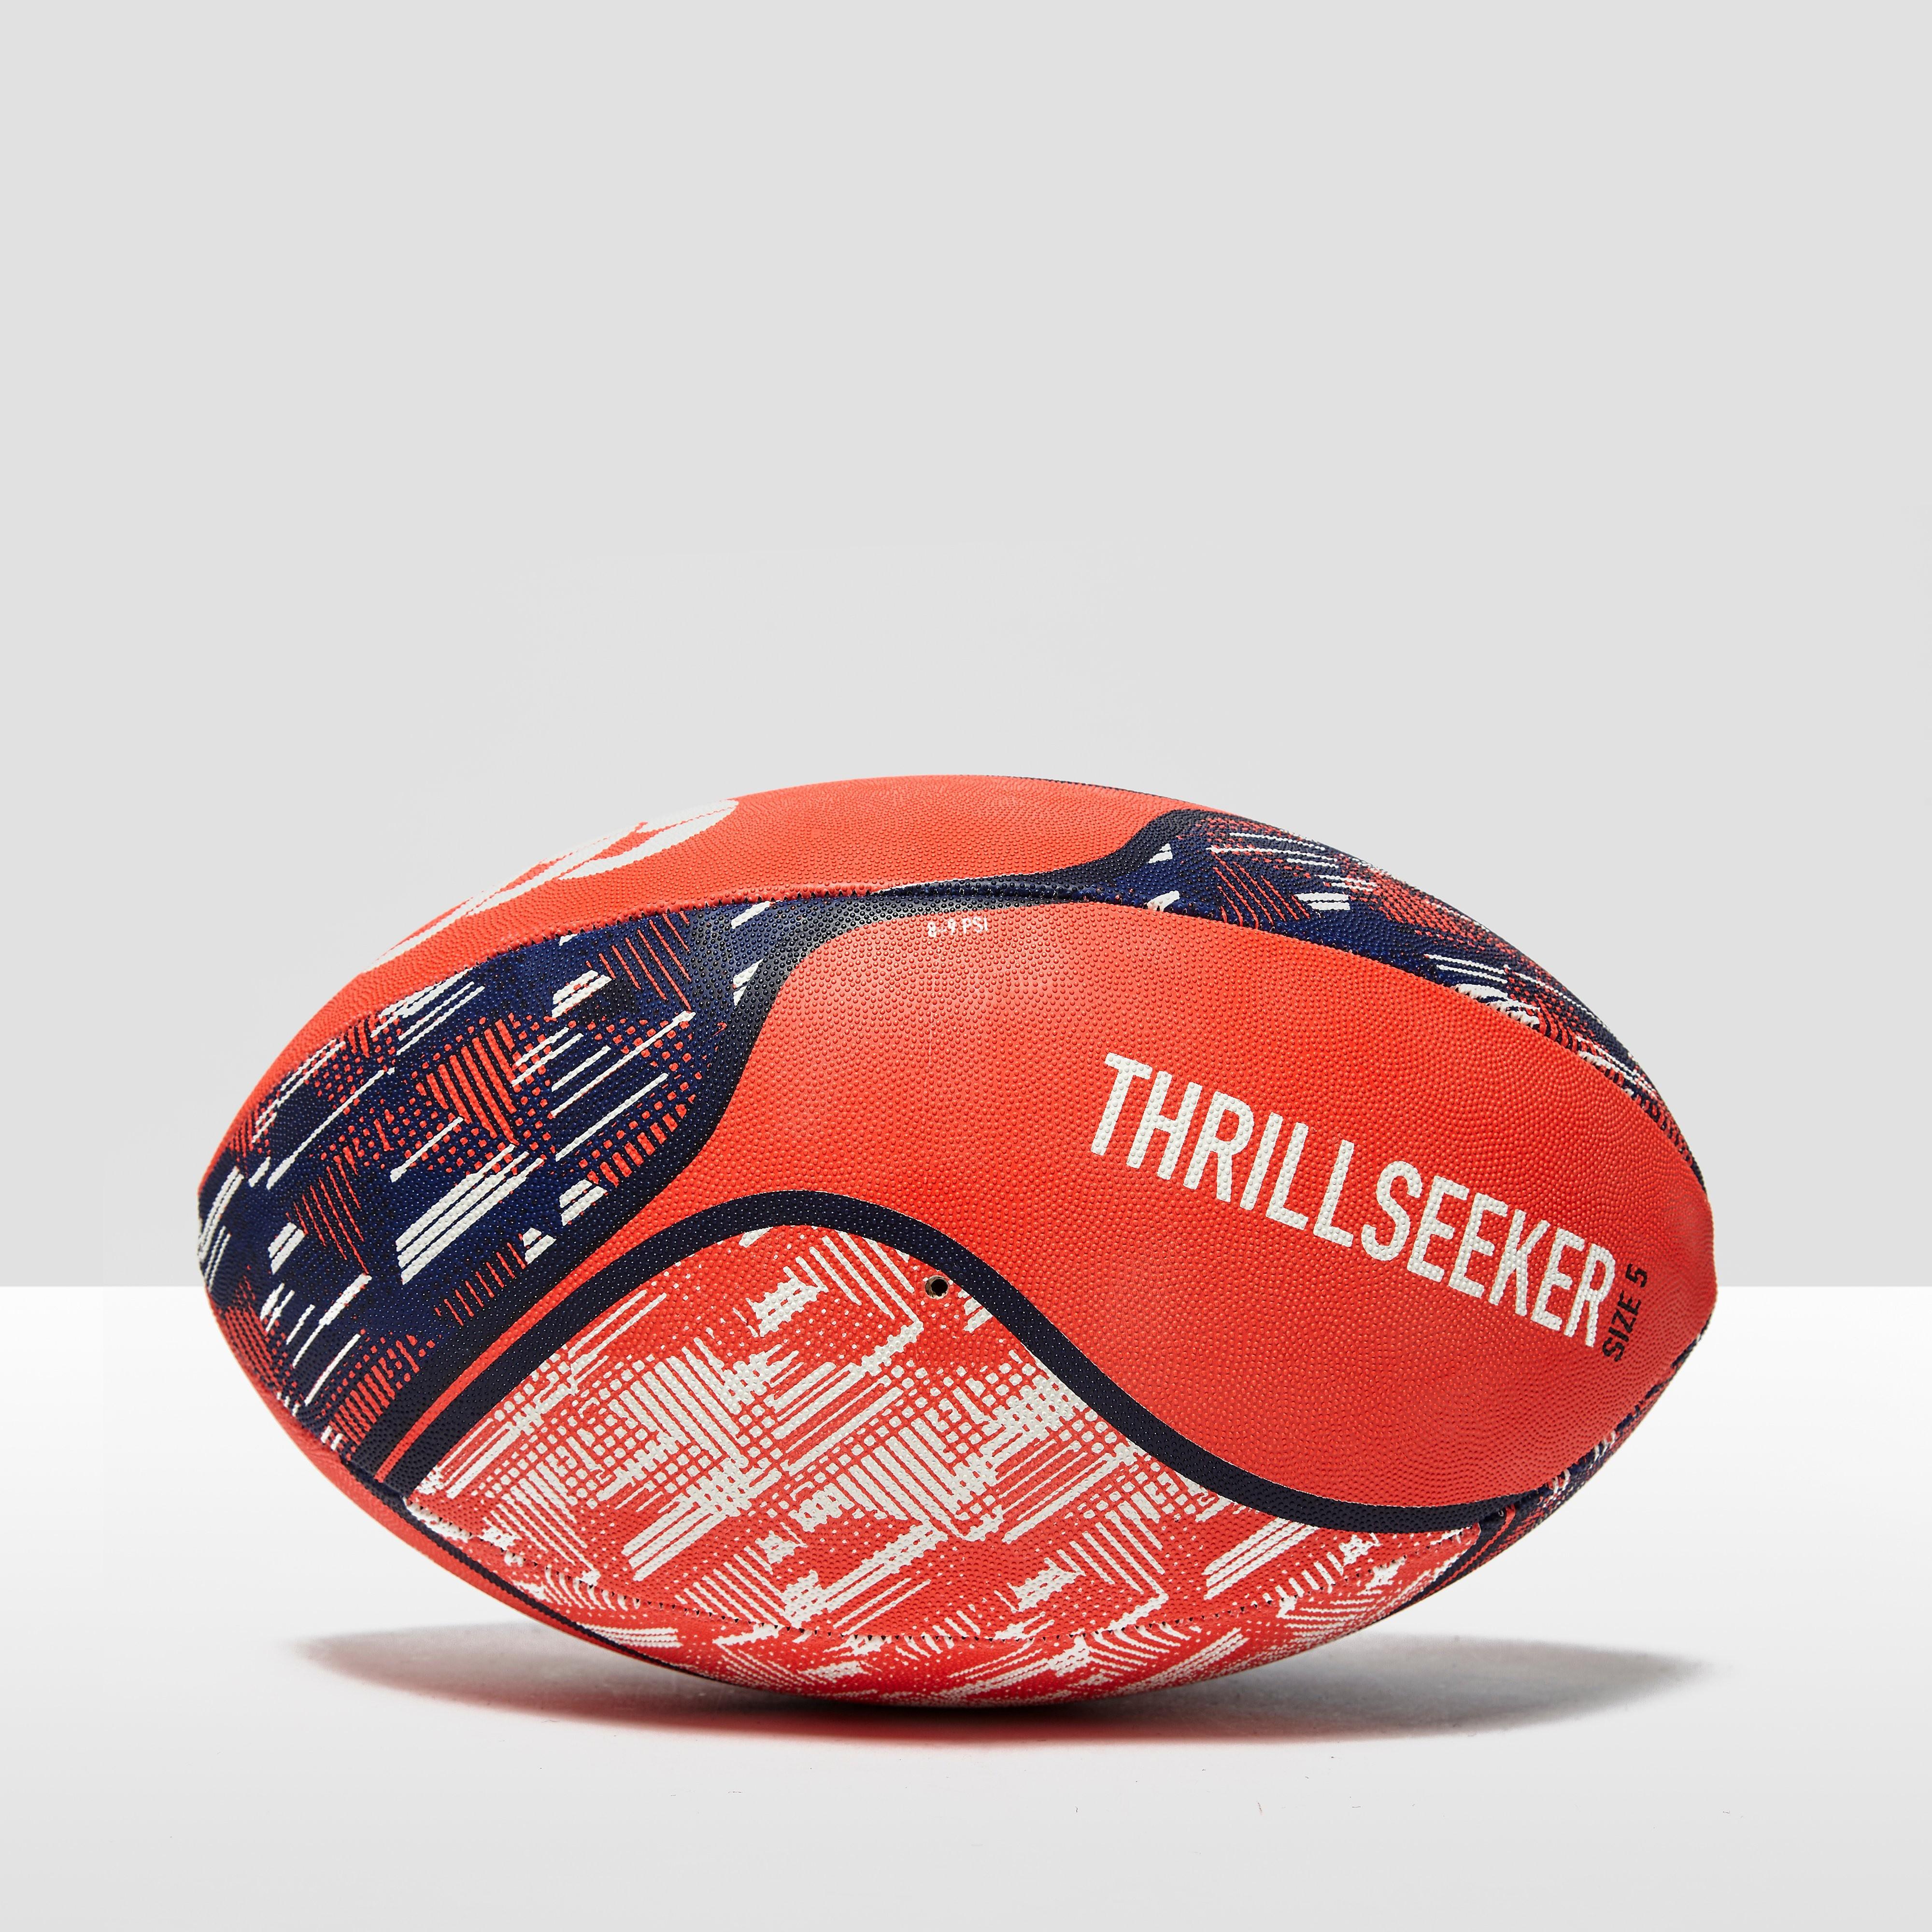 Canterbury THRILLSEEKR BALL